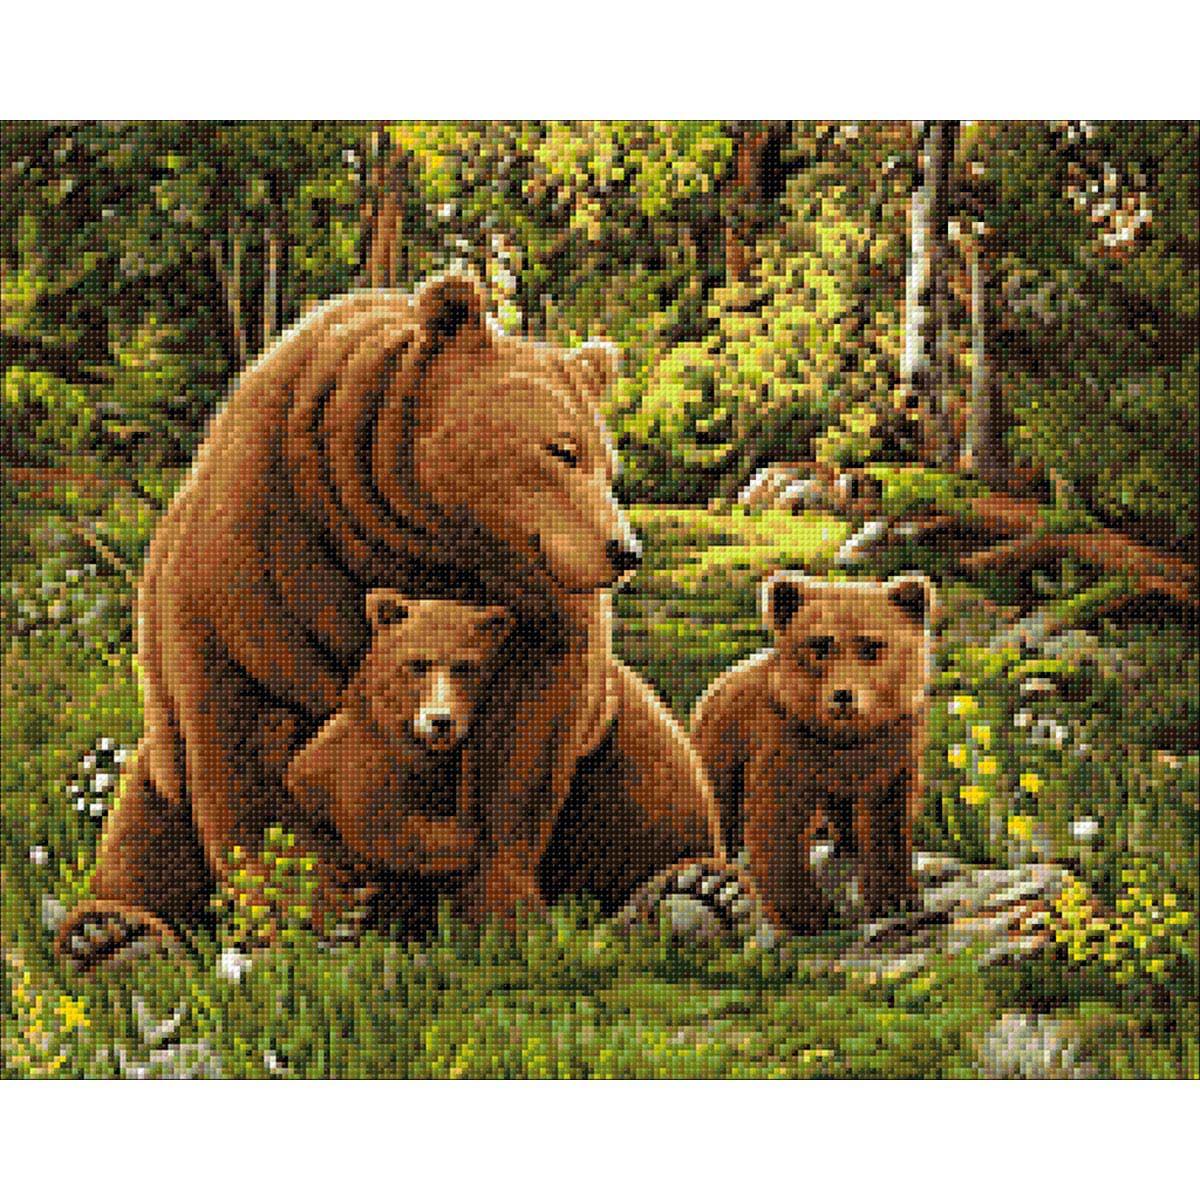 Ag 2690 Набор д/изготовления картин со стразами 'Медведица и мишки' 50*40см Гранни